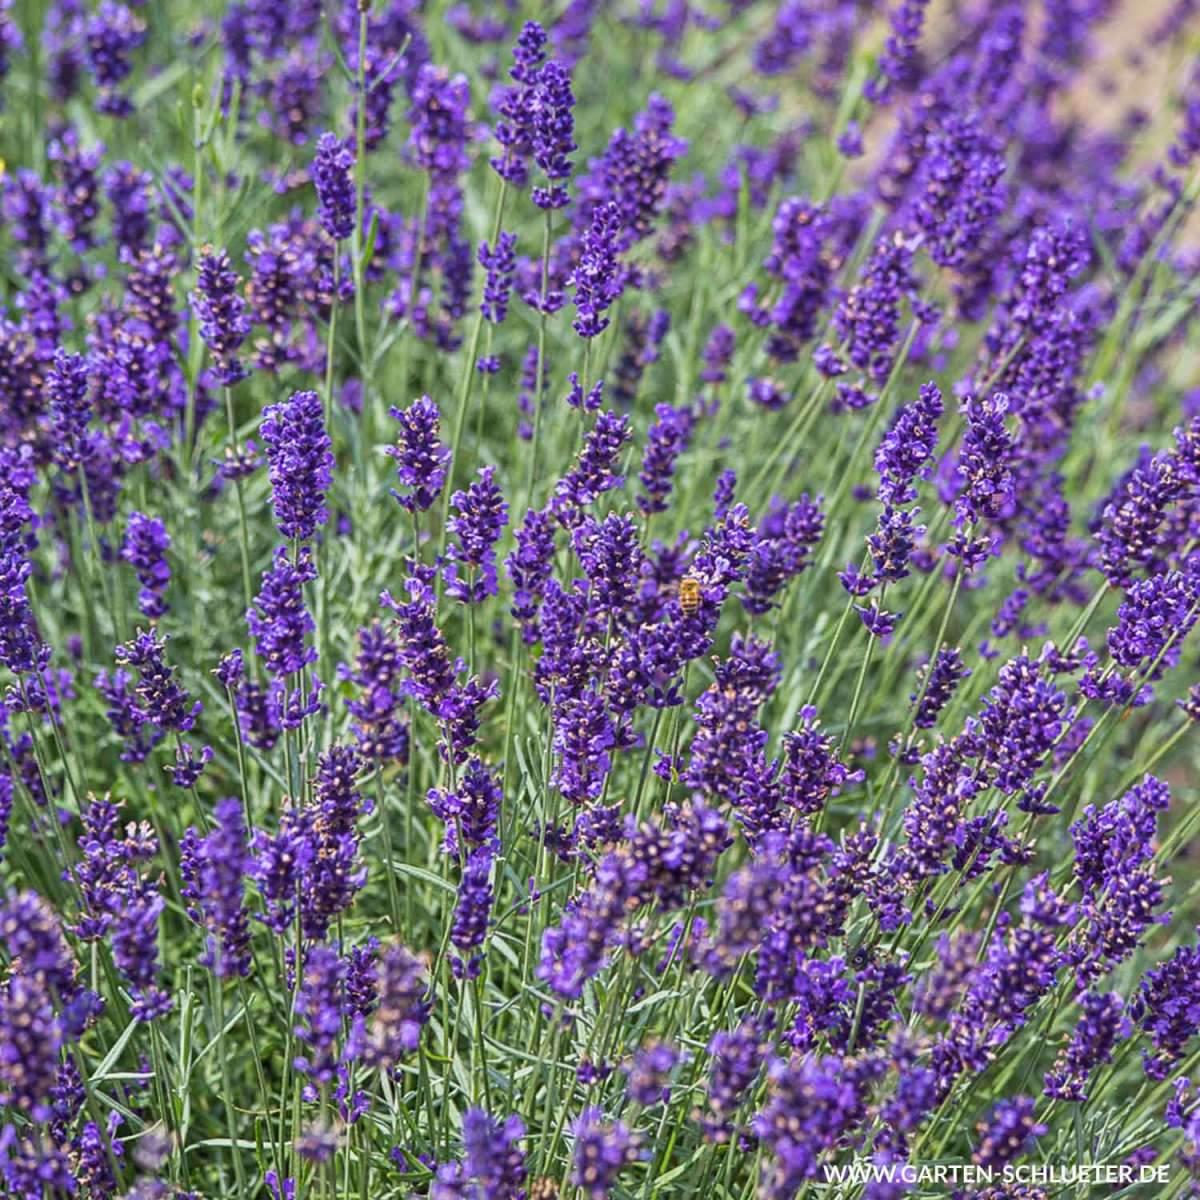 1 Lavendel Imperial Gem Lavandula angustifolia Imperial Gem 600x600 2x